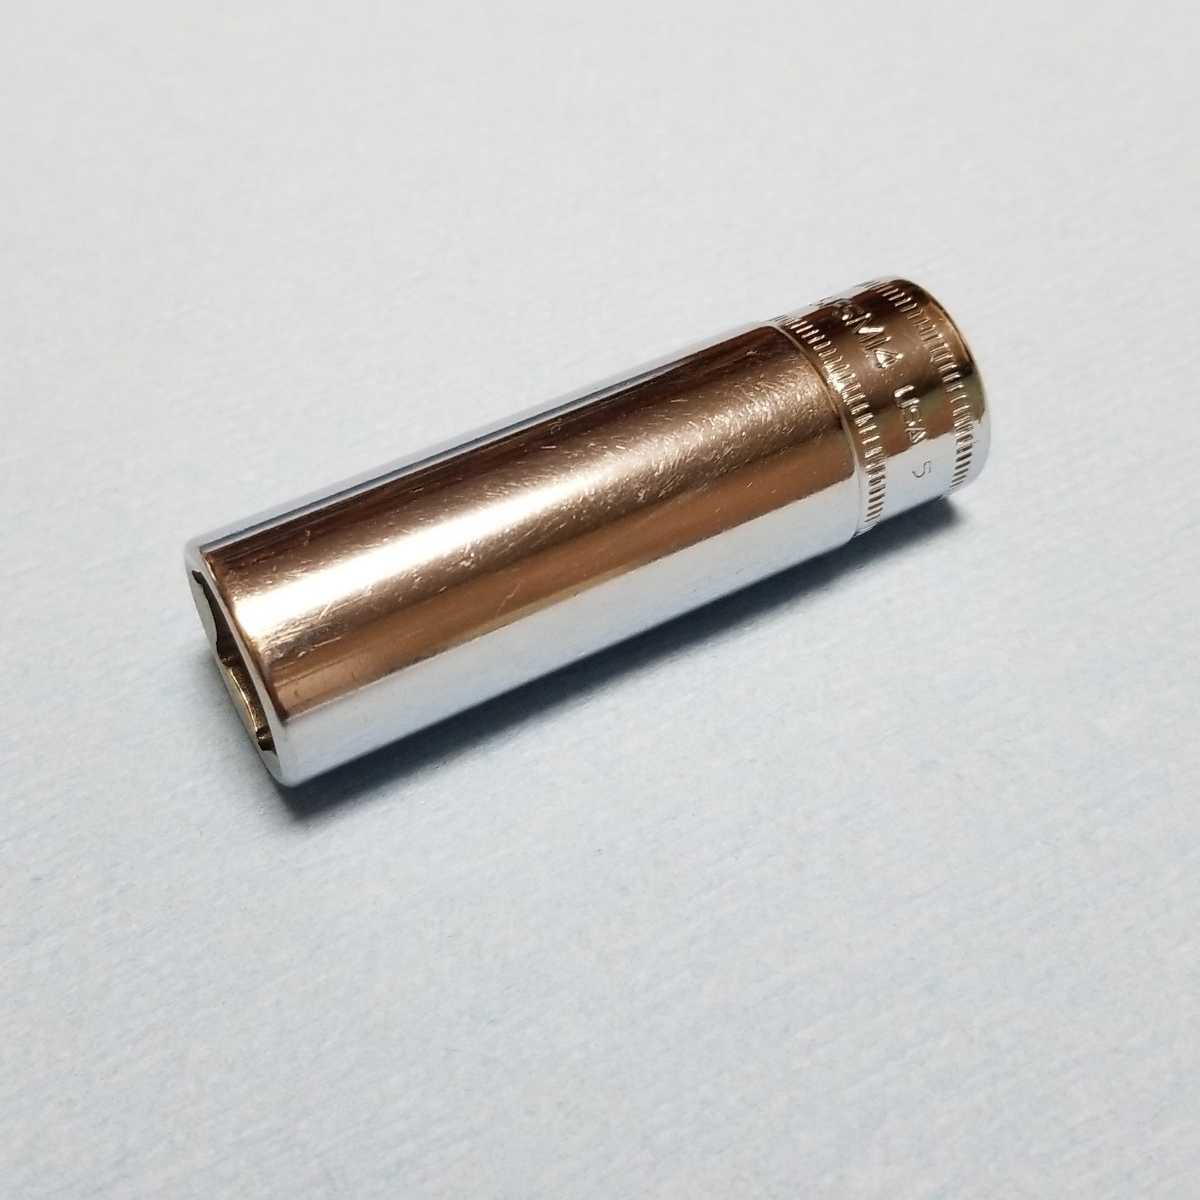 14mm 3/8 ディープ スナップオン SFSM14 (6角) 中古品 美品 保管品 SNAPON SNAP-ON ディープソケット ソケット 送料無料 Snap-on _画像8